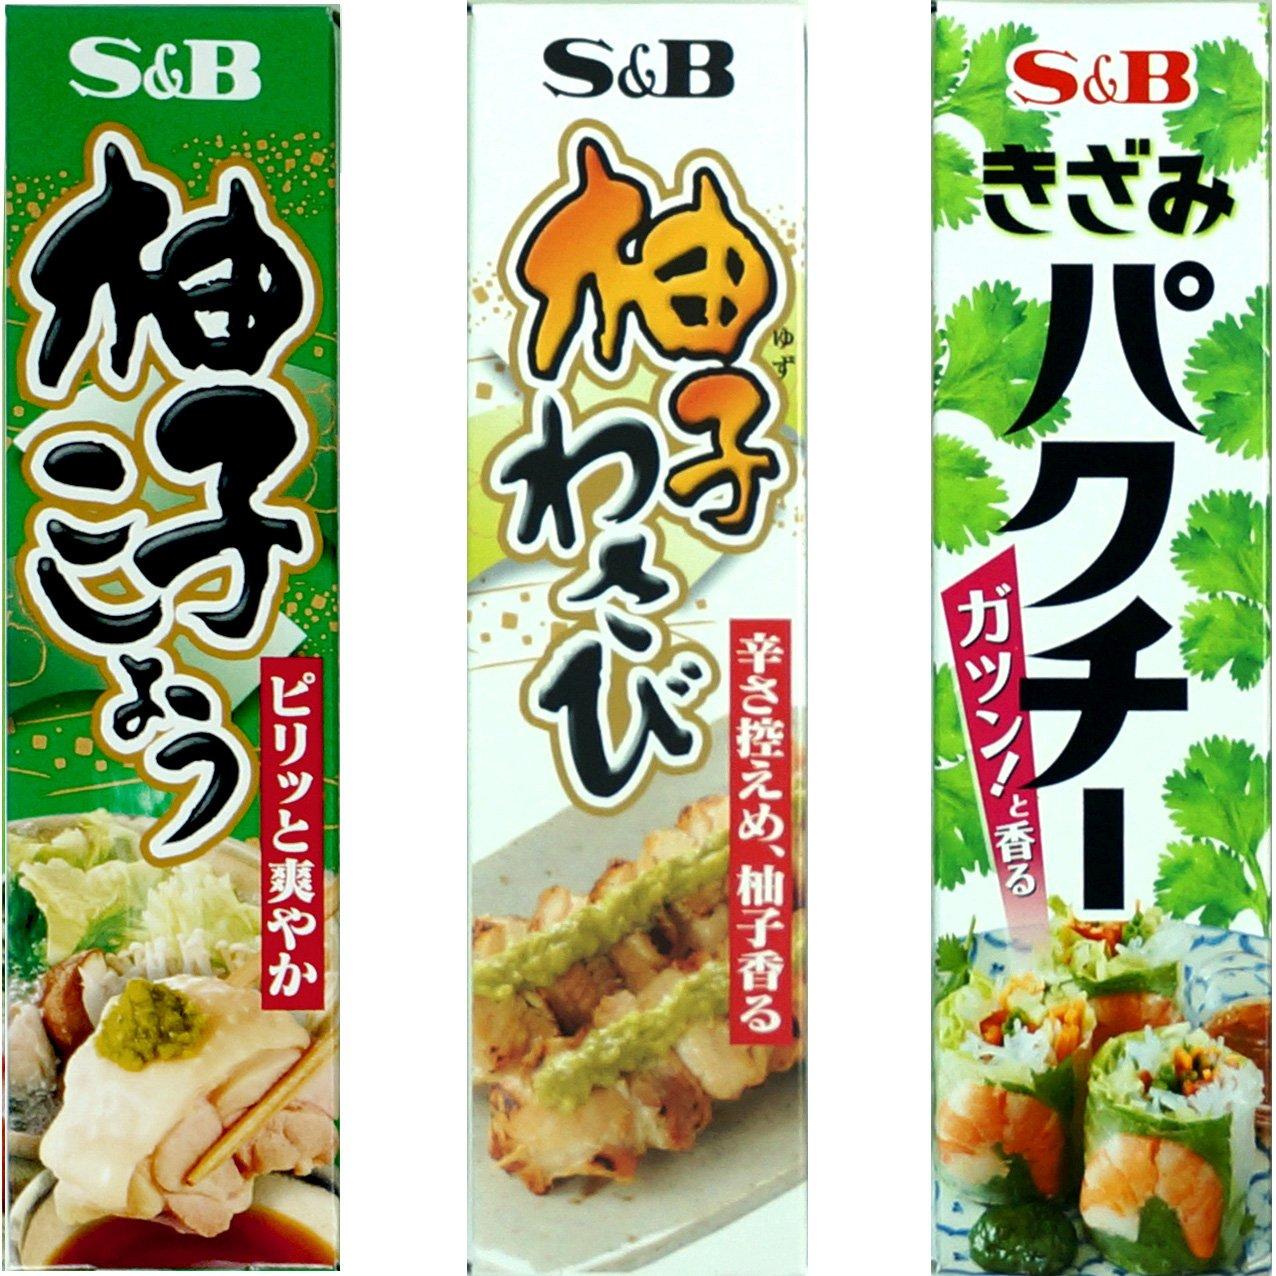 Assortment of Japanese Seasoning Yuzu Kosho (Citron Pepper), Yuzu(Citron) Wasabi, Shredded Pakuchi